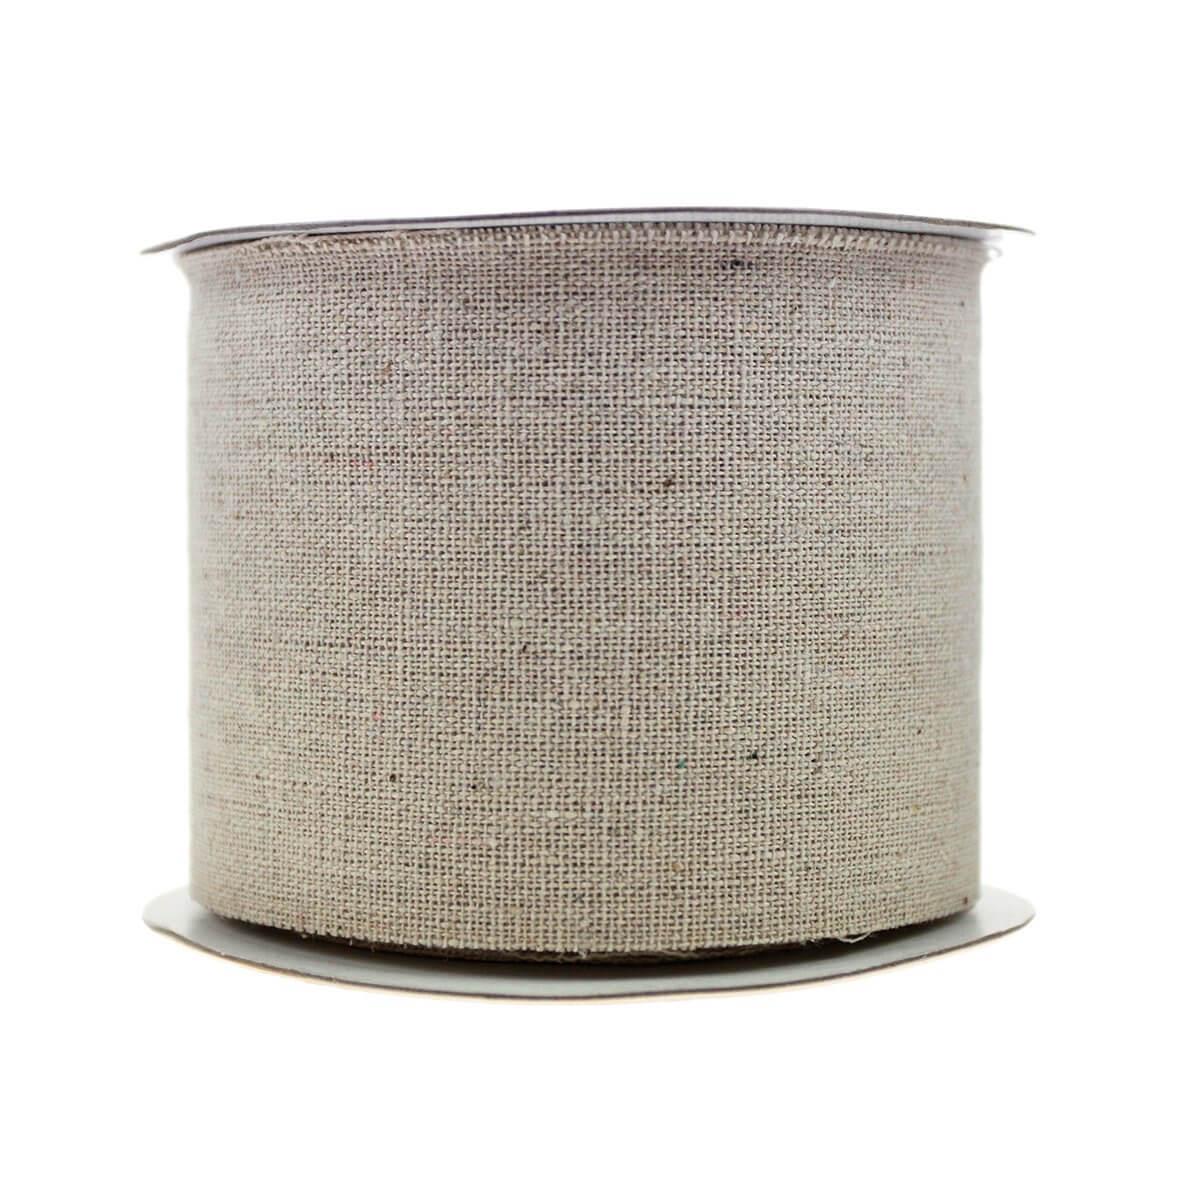 Frayed Edge 70mm Burlap Ribbon - Natural Linen